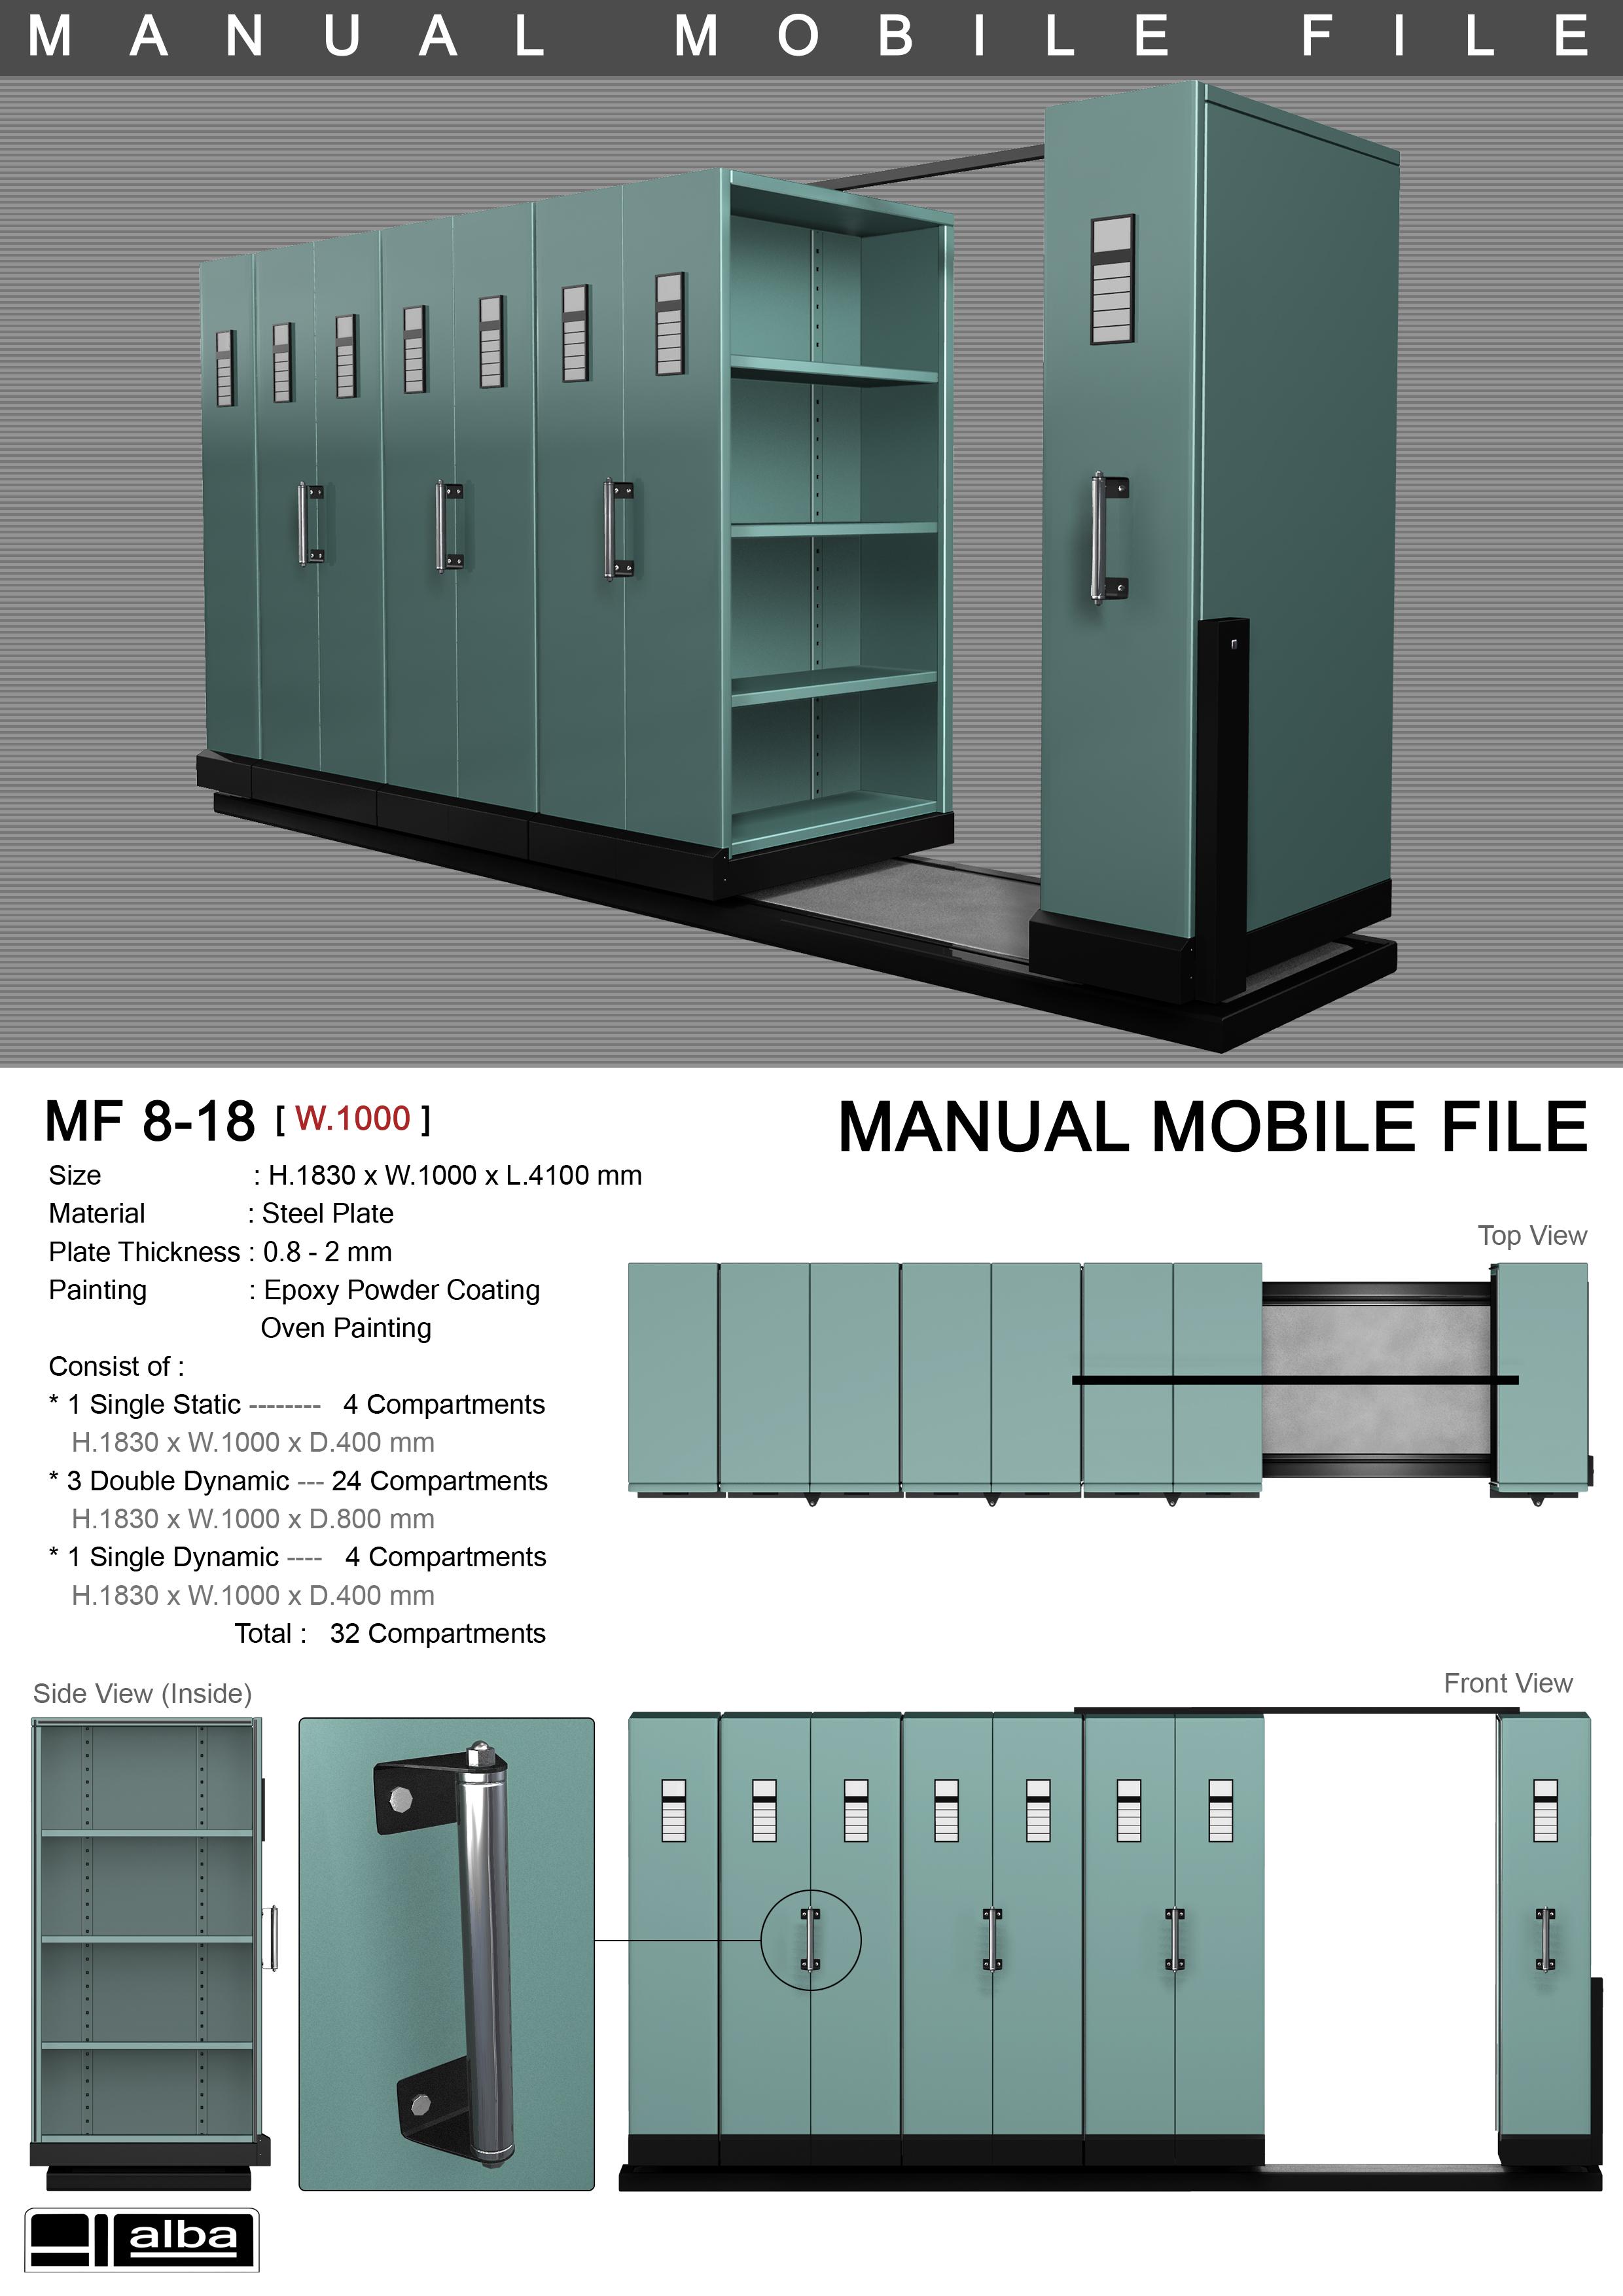 Mobile File Manual Alba 8-18